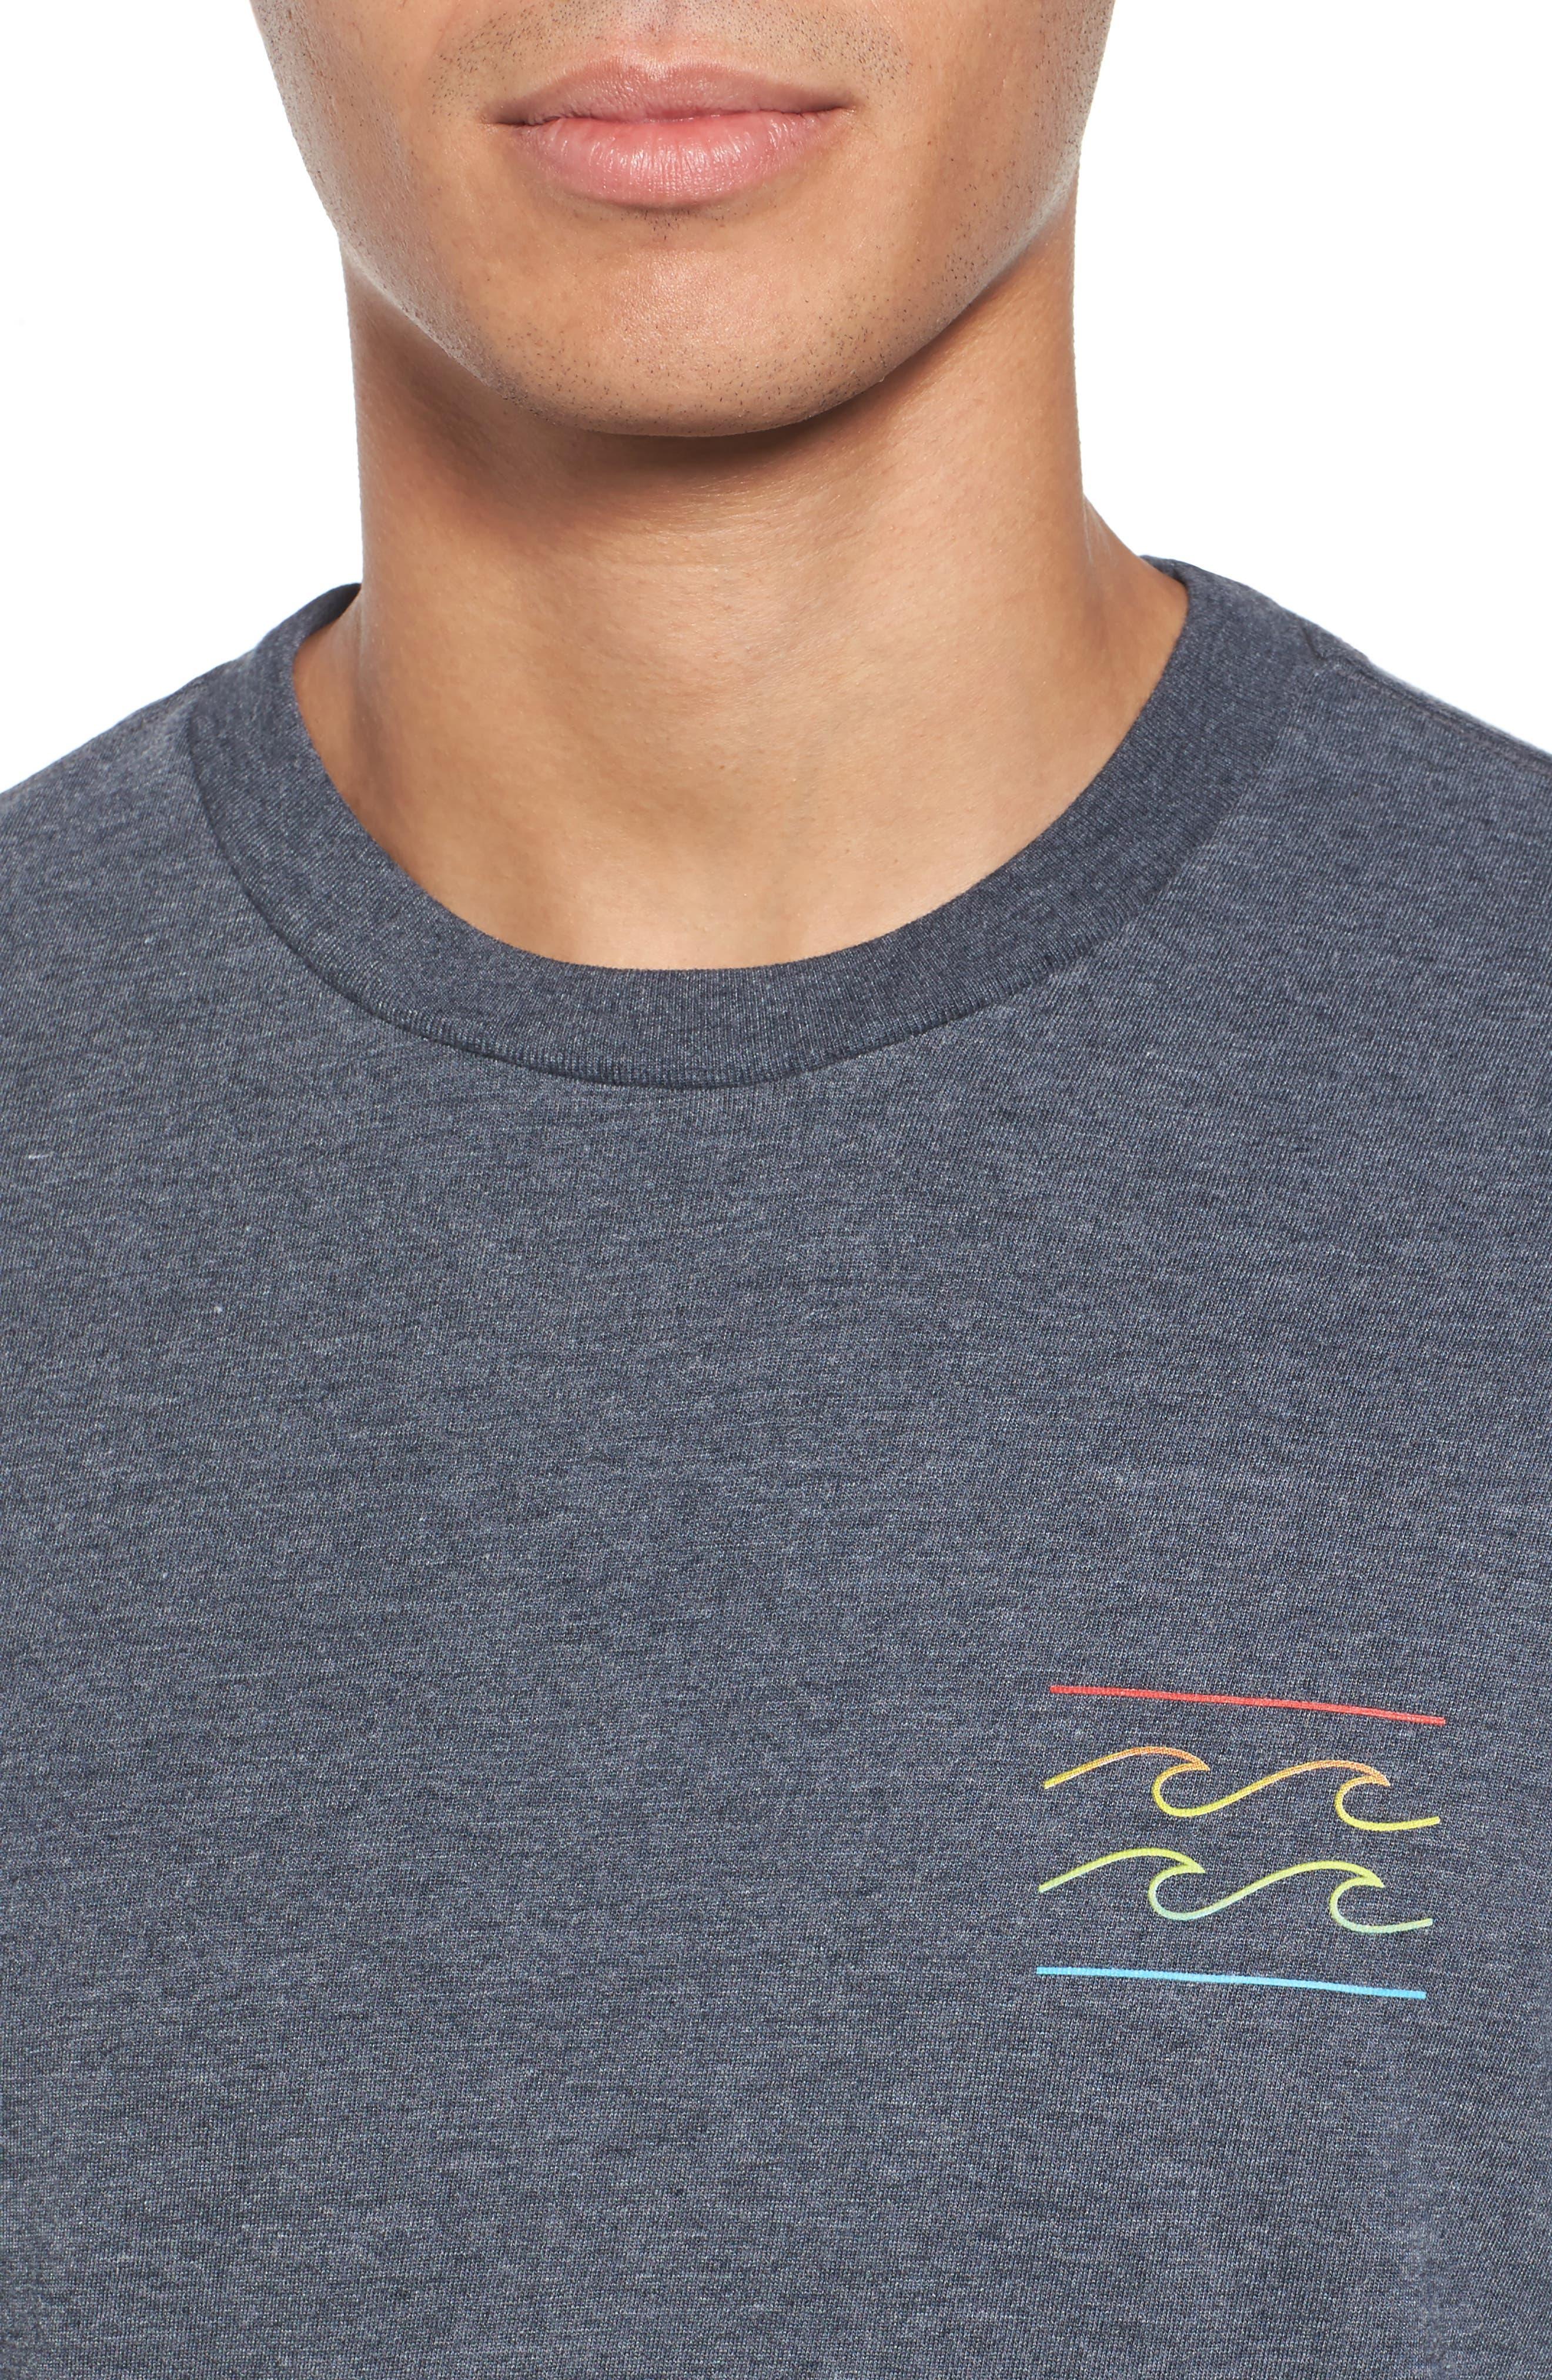 Flat Line T-Shirt,                             Alternate thumbnail 4, color,                             Indigo Heather